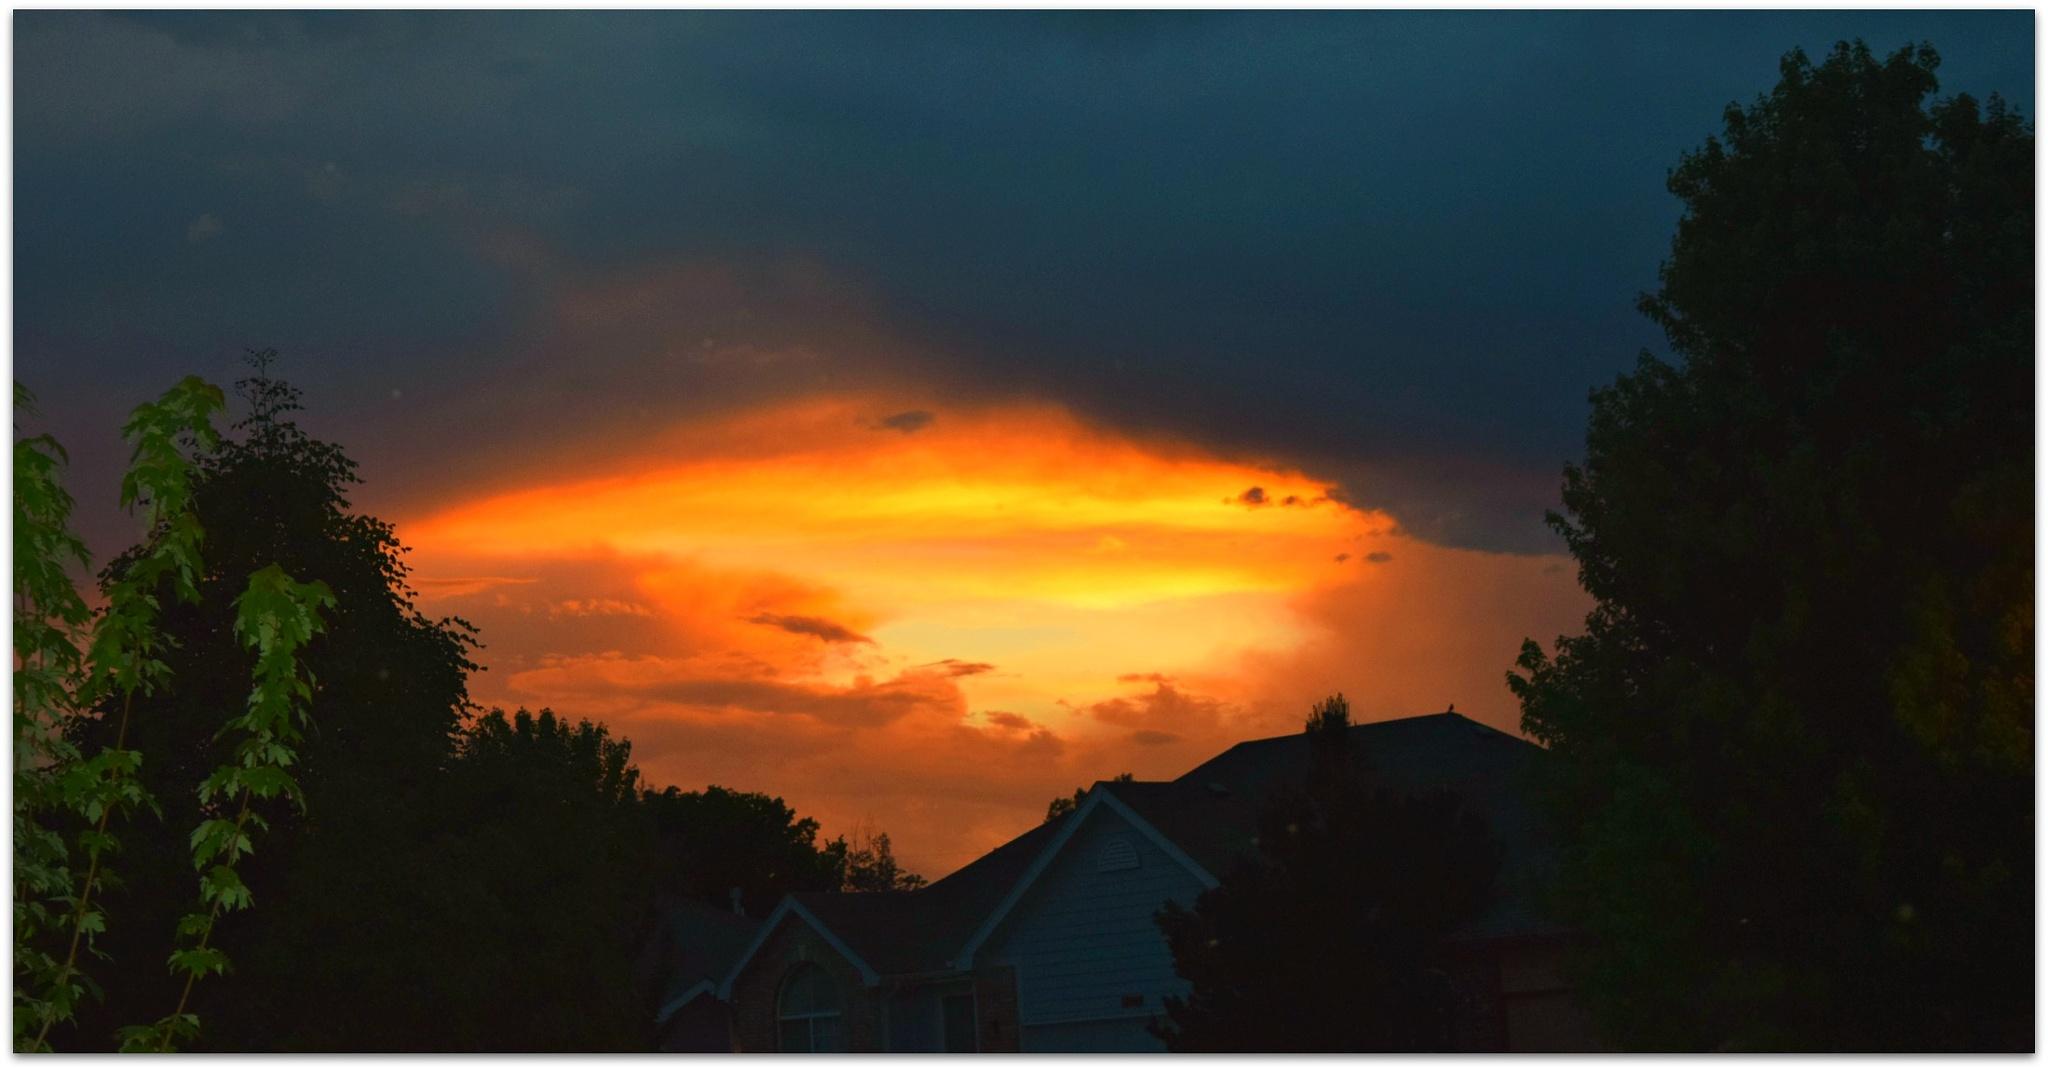 Sunset by maria.telegdy